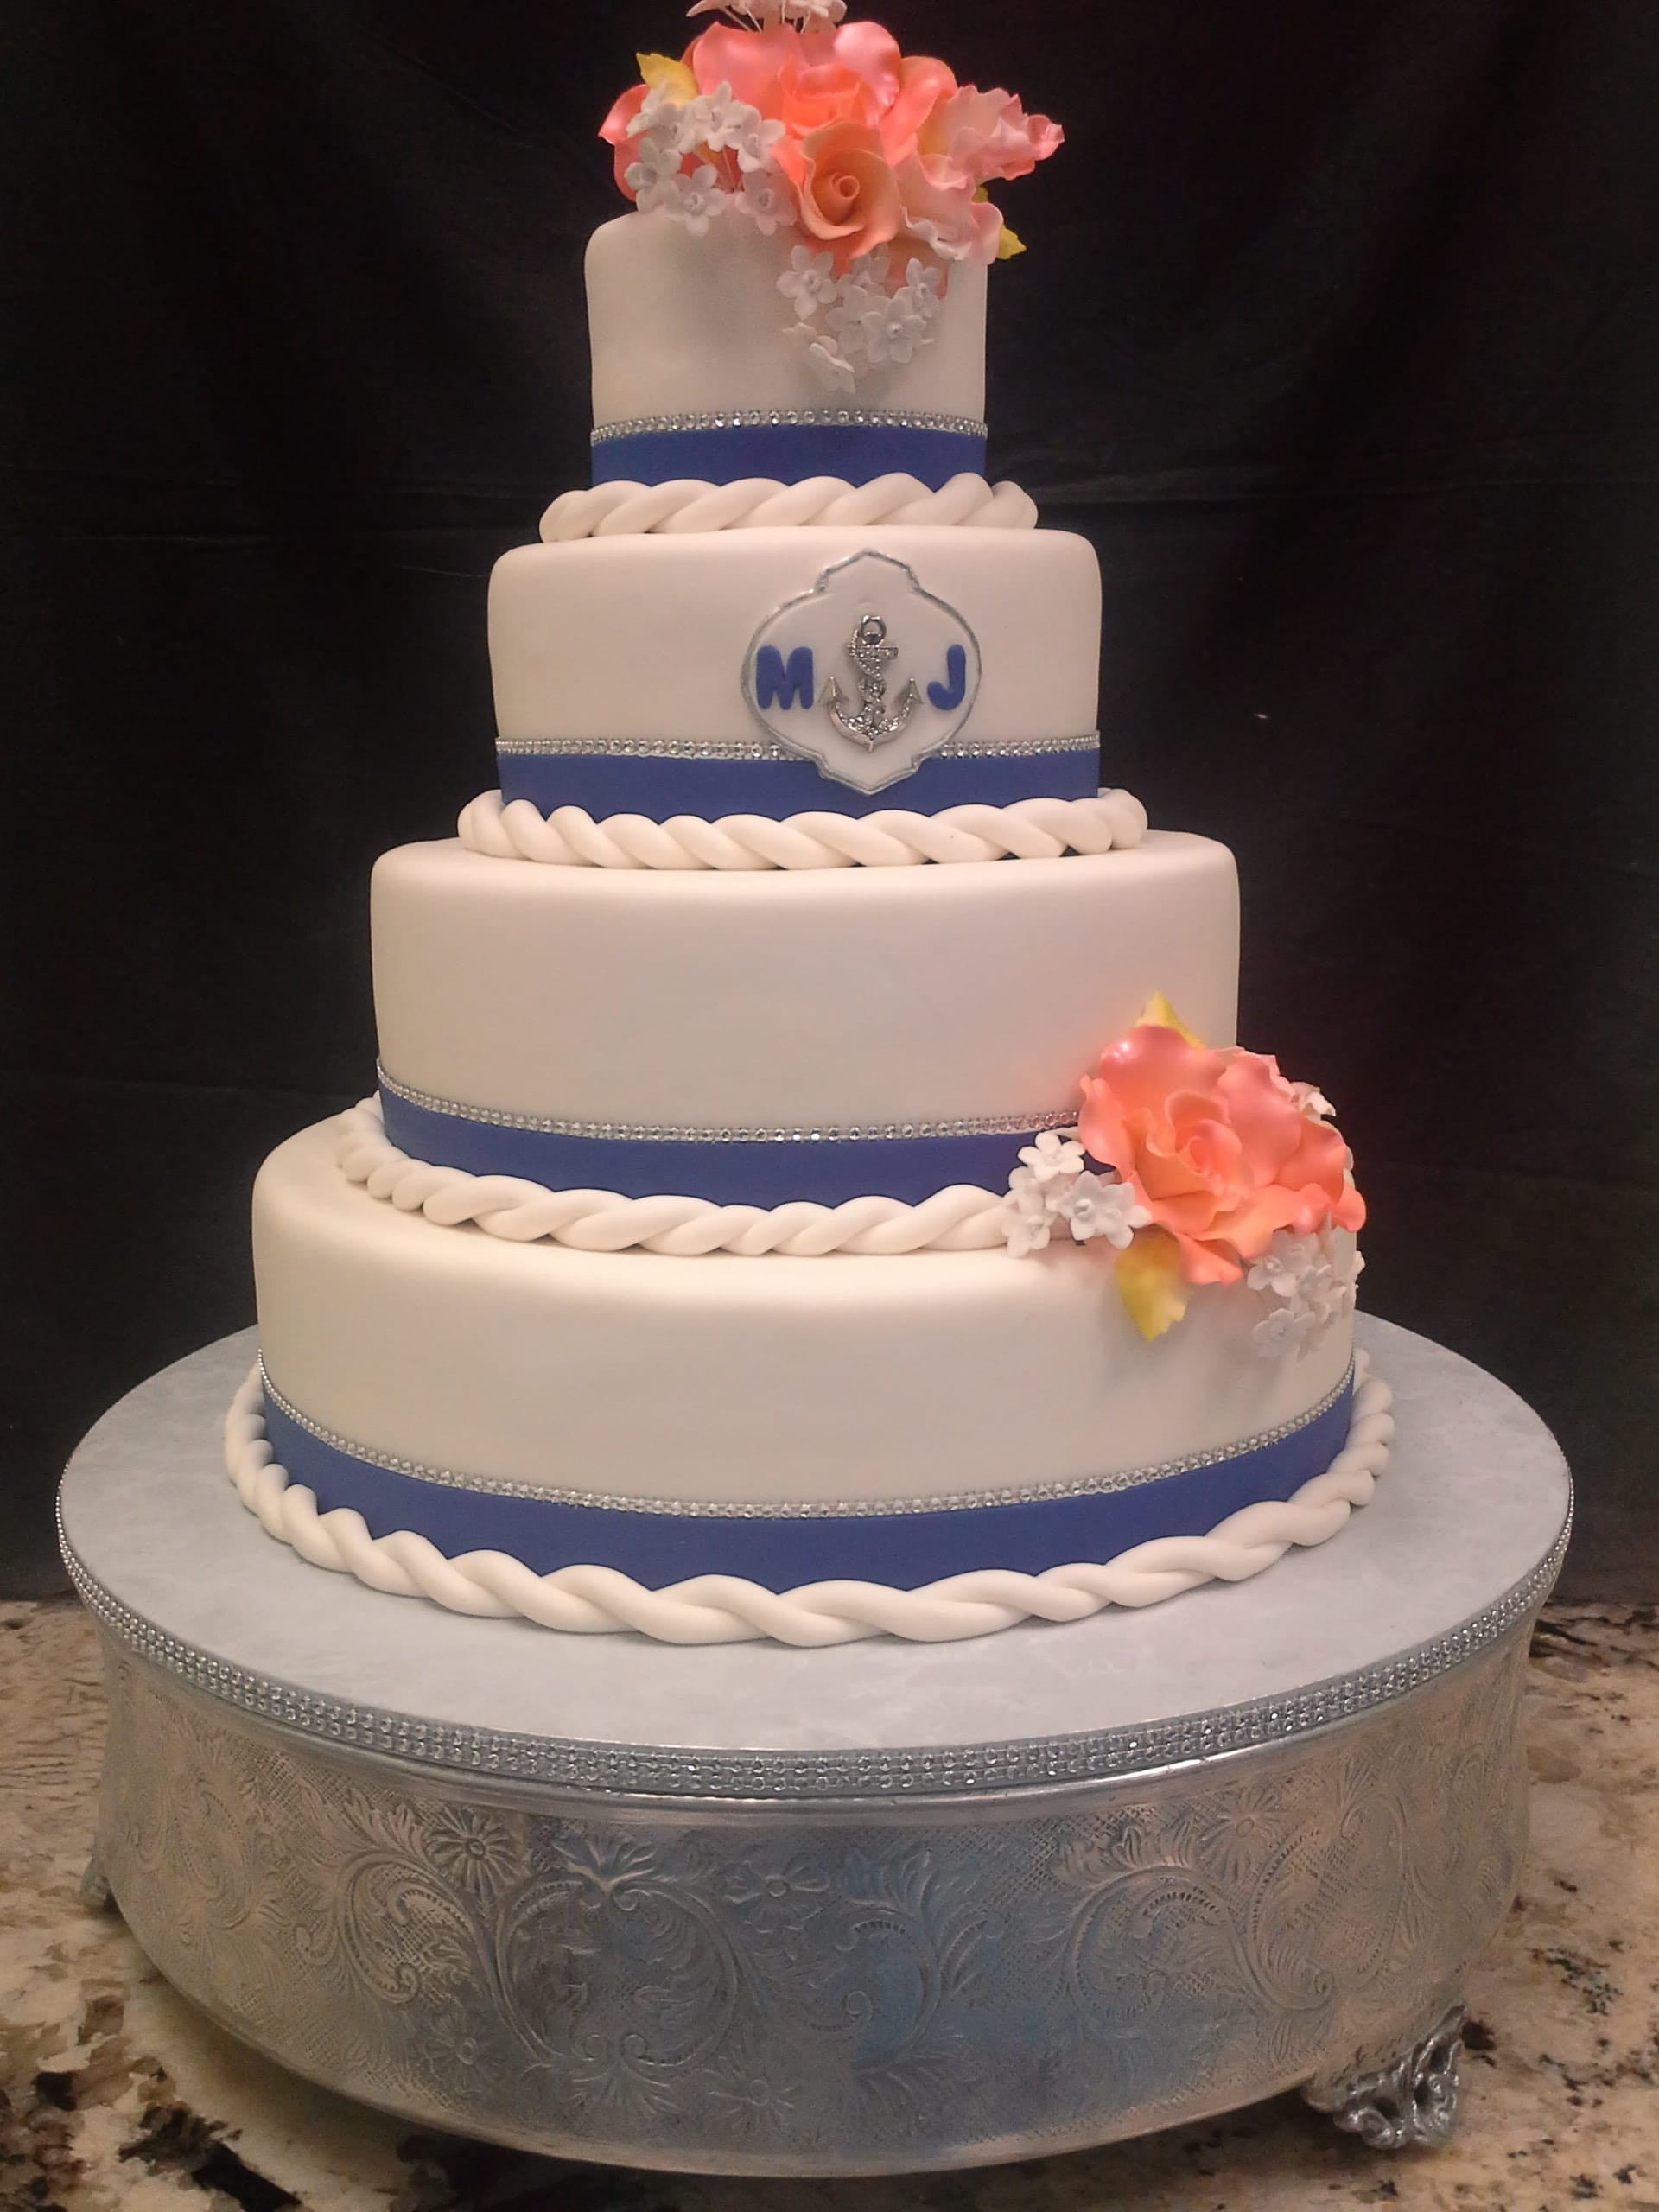 Wedding Cakes Sarasota  WEDDINGS Cakes by Ron Sarasota s 1 Bakery